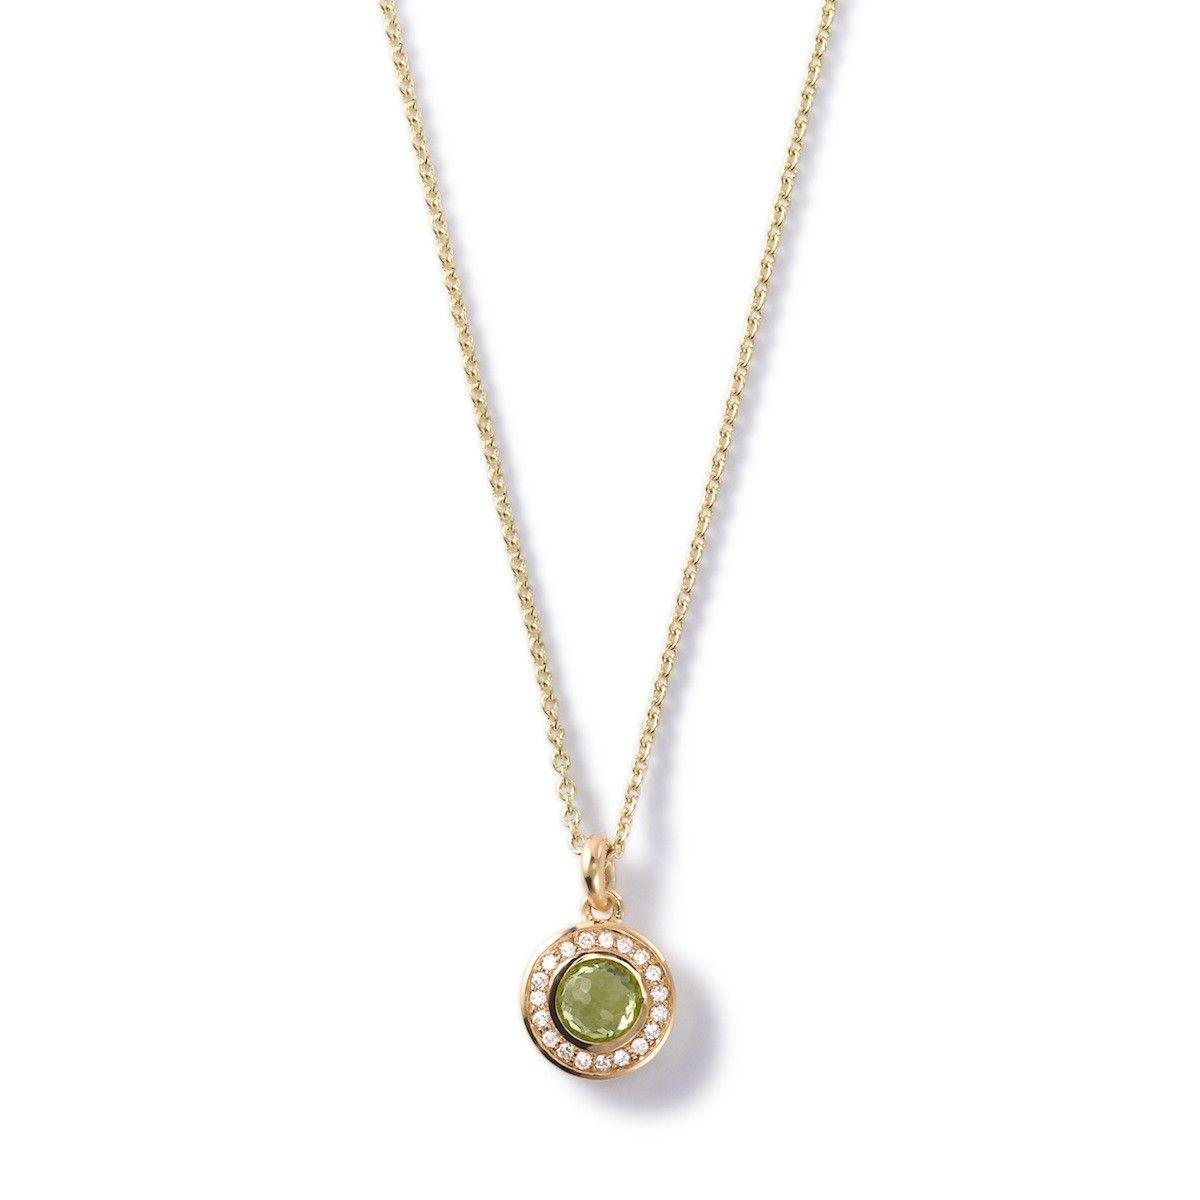 Lollipop® 18K Gold Mini Pendant Necklace with Diamonds